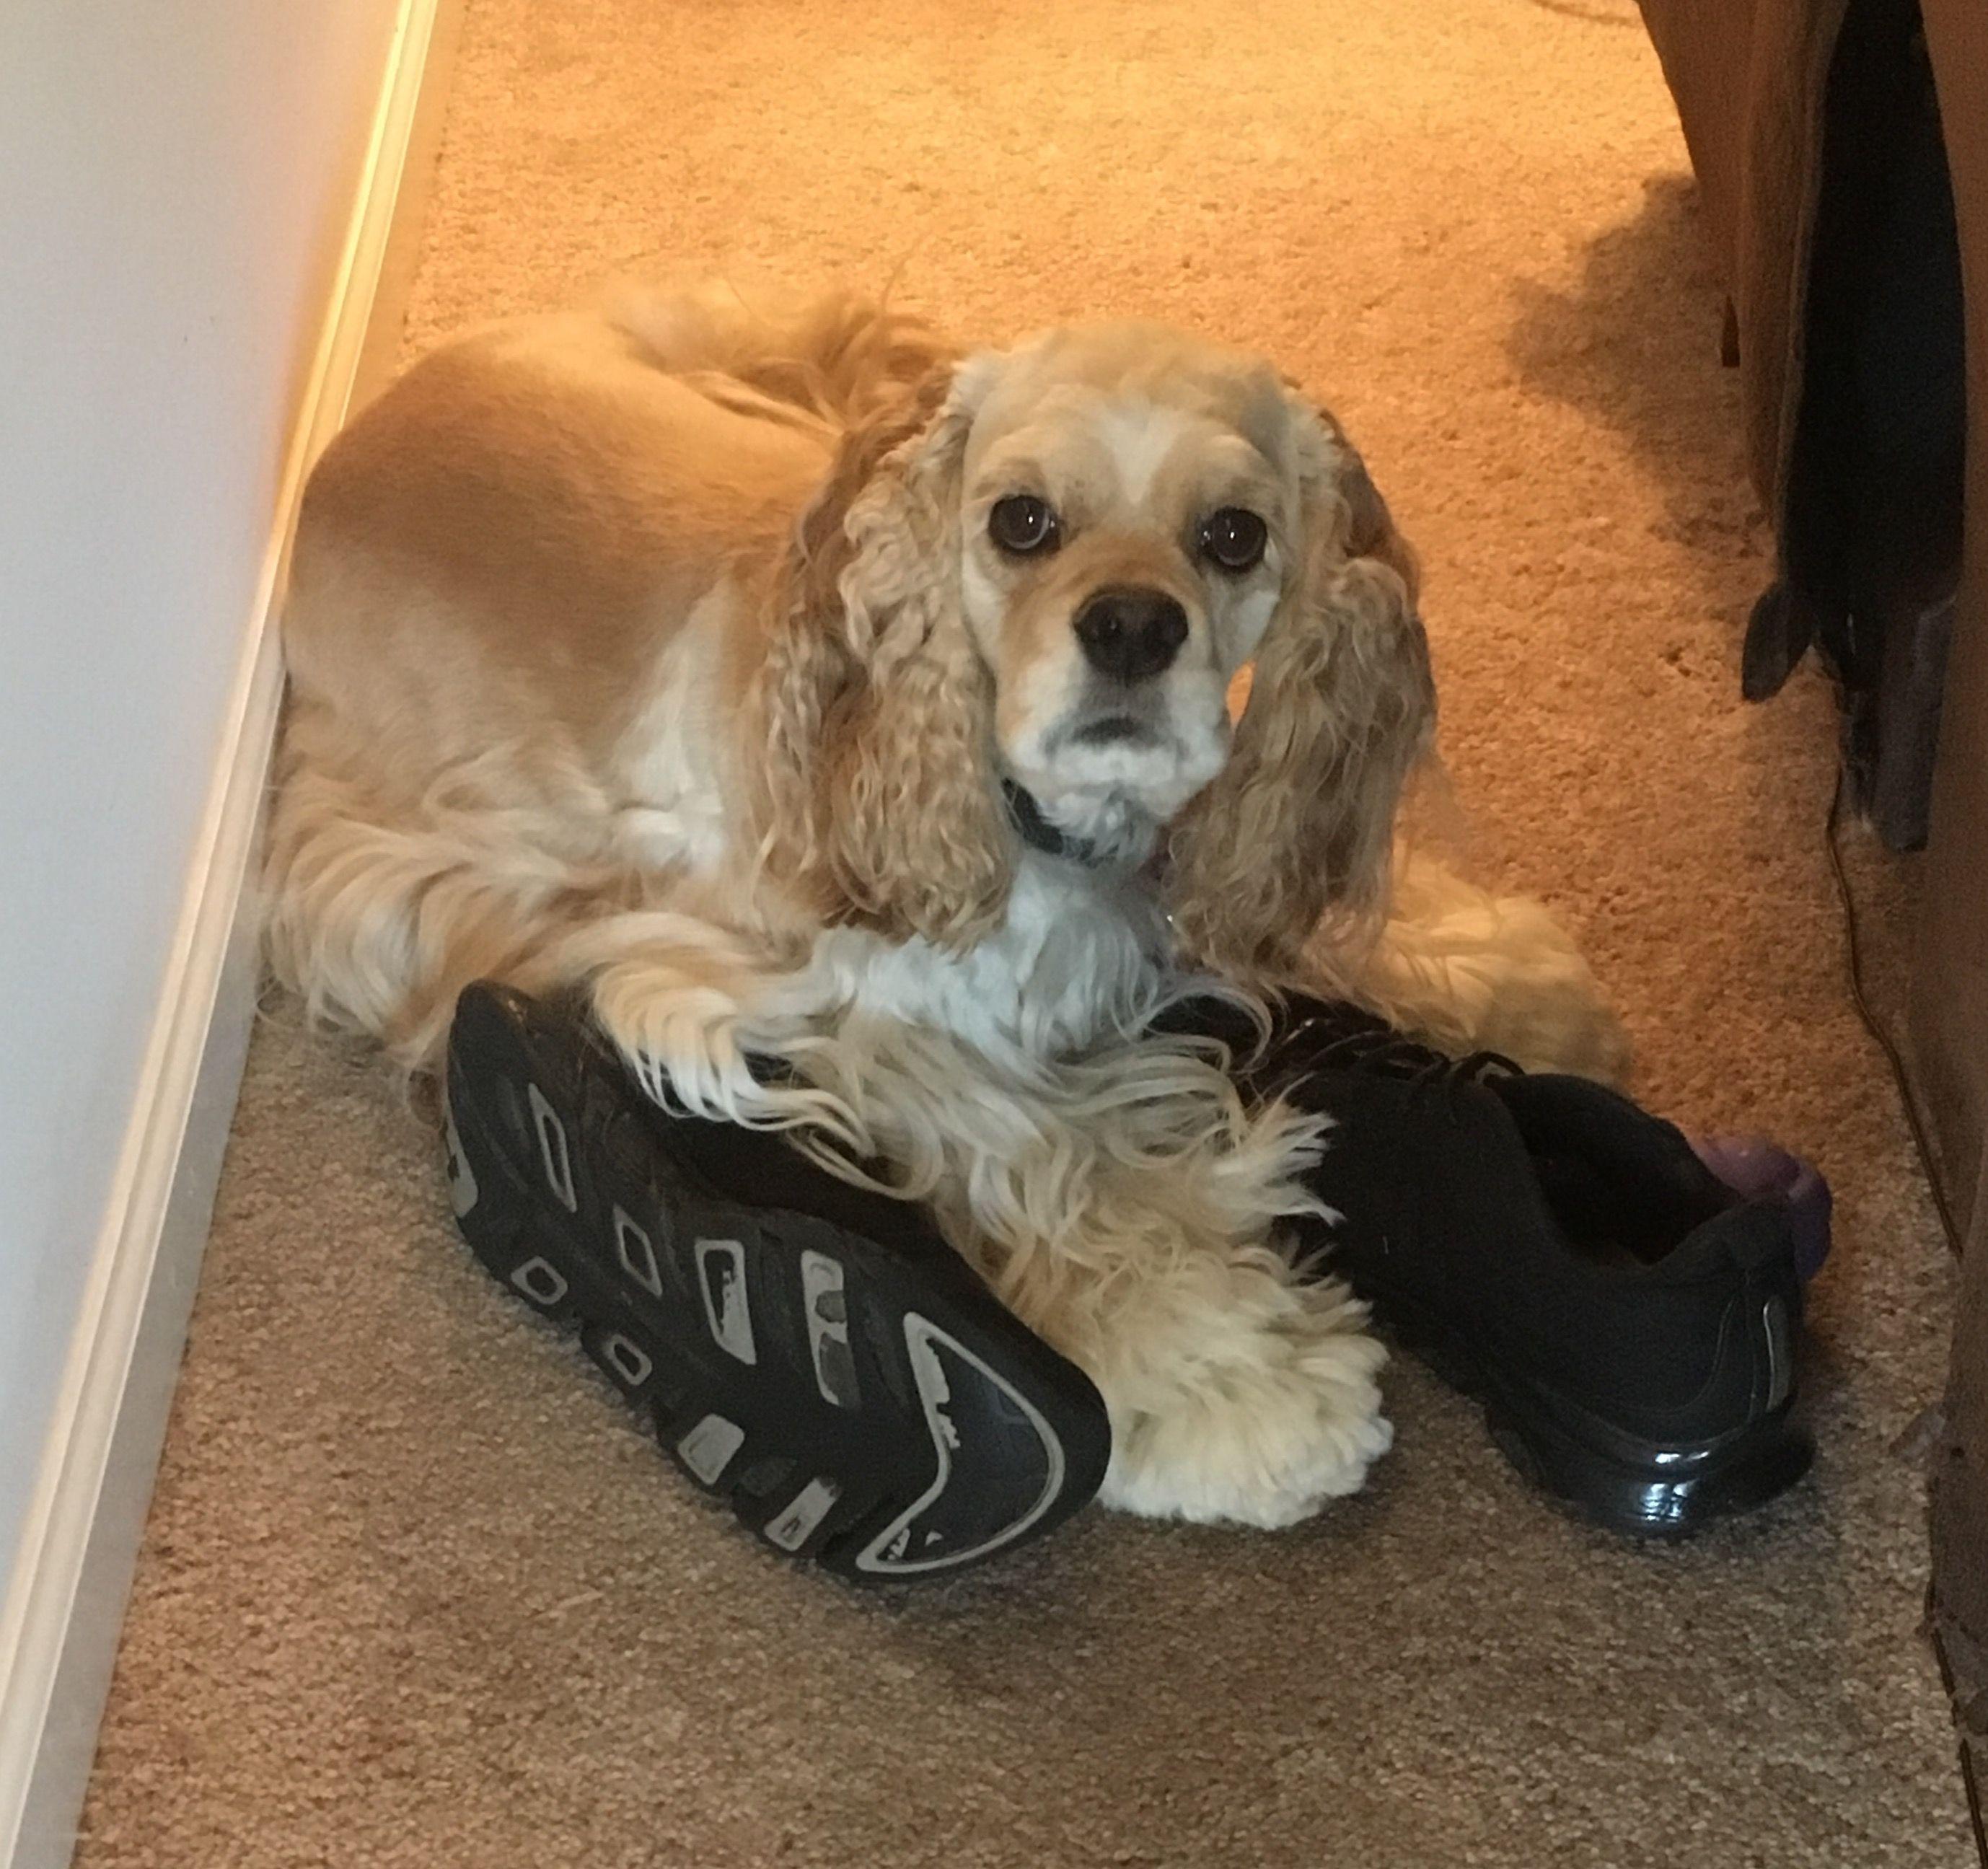 Cocker spaniel steals shoes Cocker spaniel, American